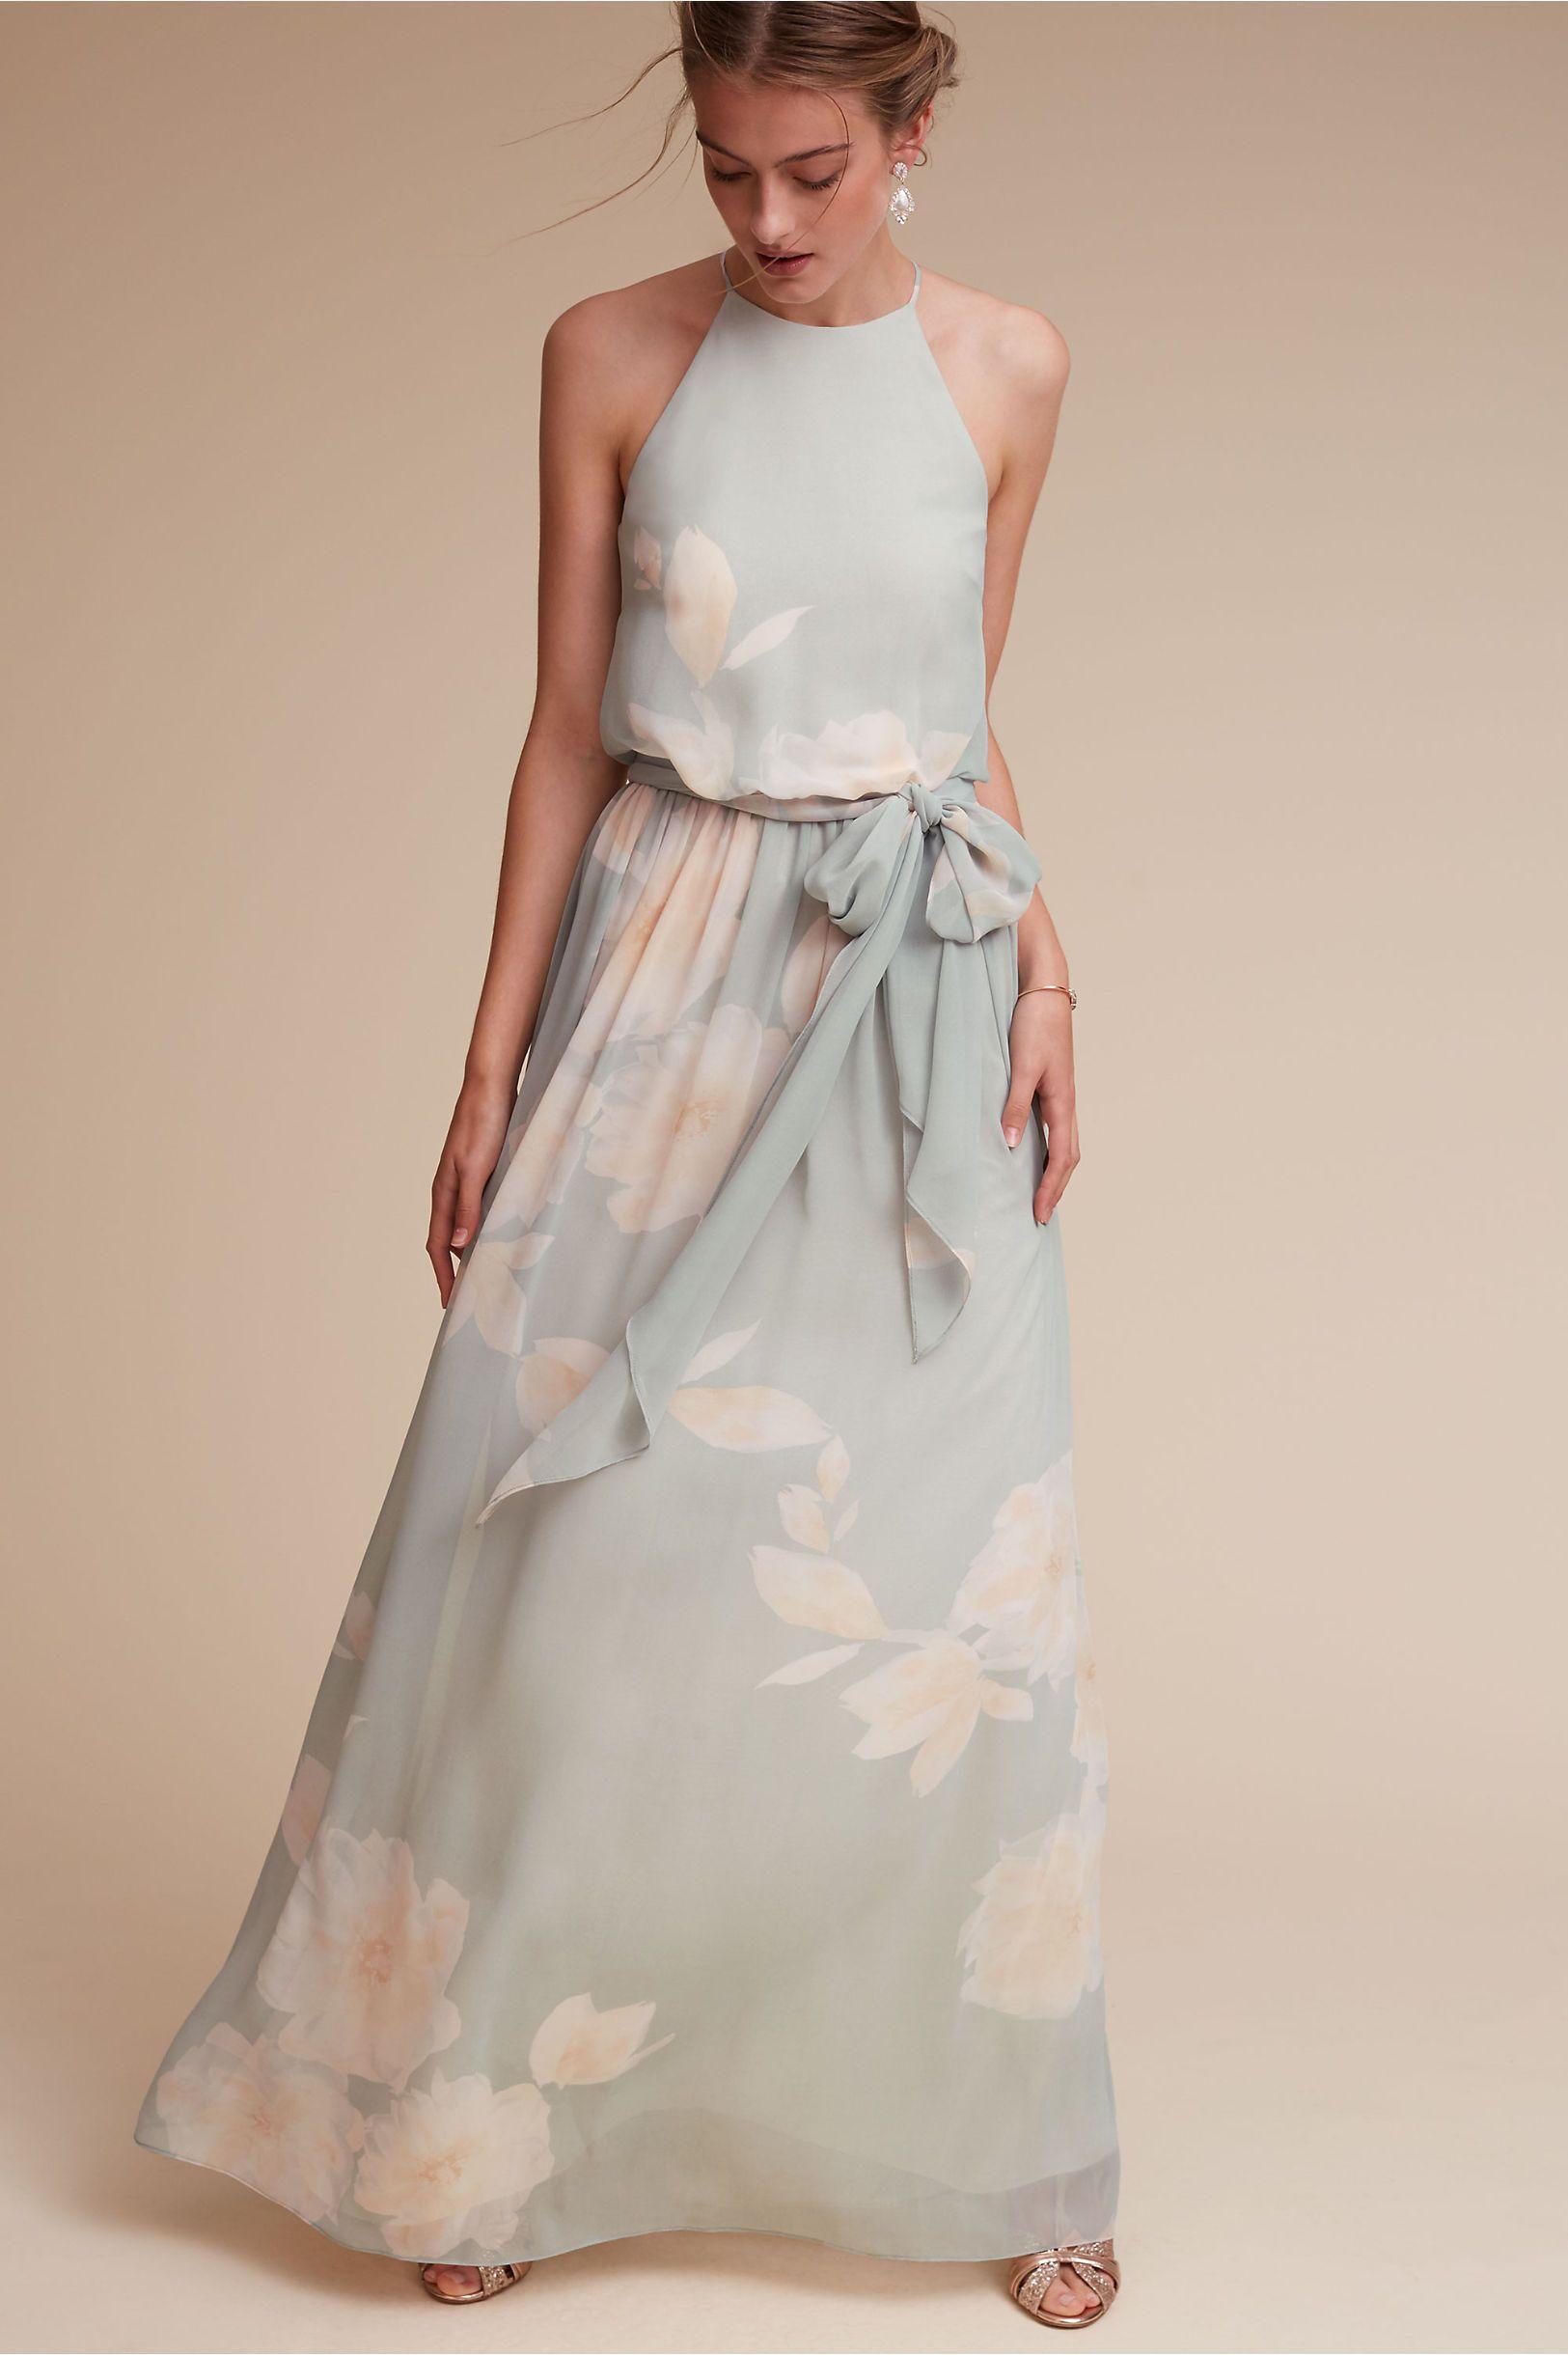 BHLDN Alana Dress in Bridesmaids Bridesmaid Dresses Long | BHLDN ...